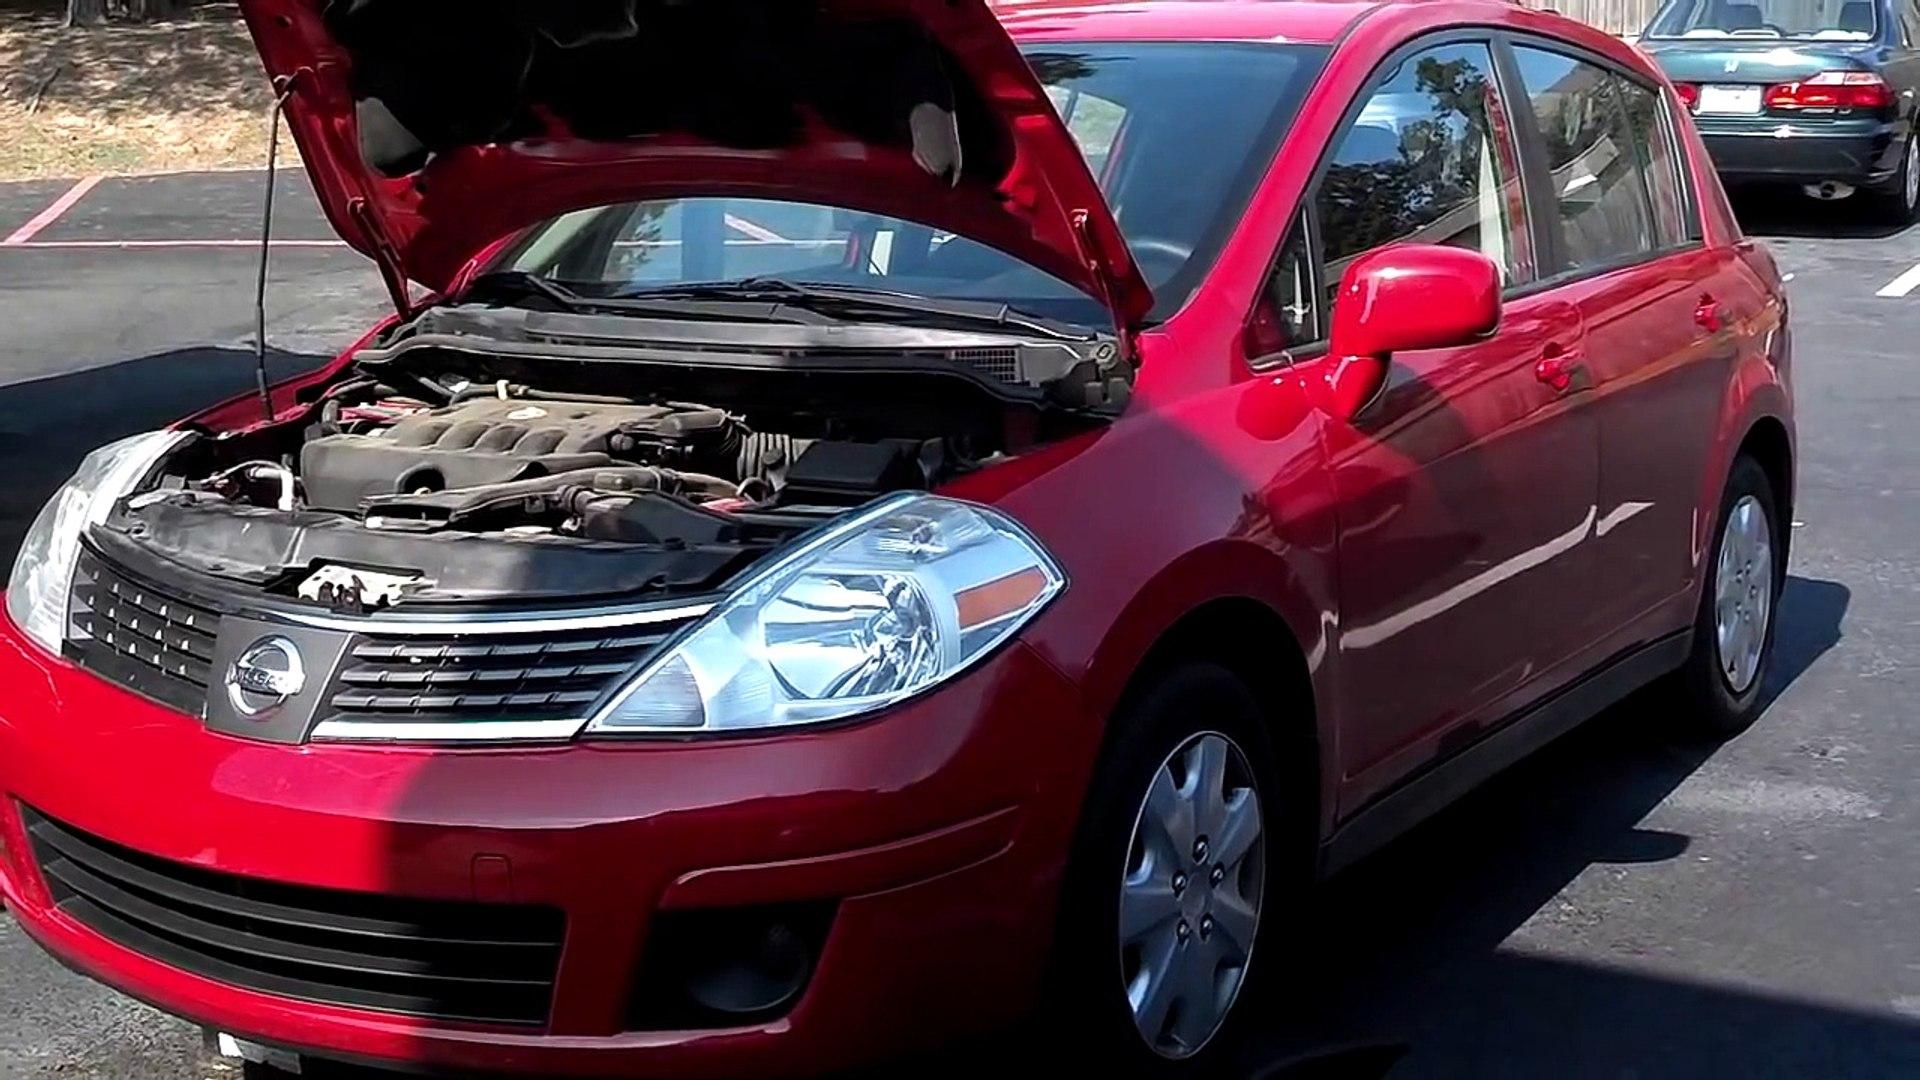 Nissan Versa (Tiida) AC Compressor Replacement - Auto Repair Series